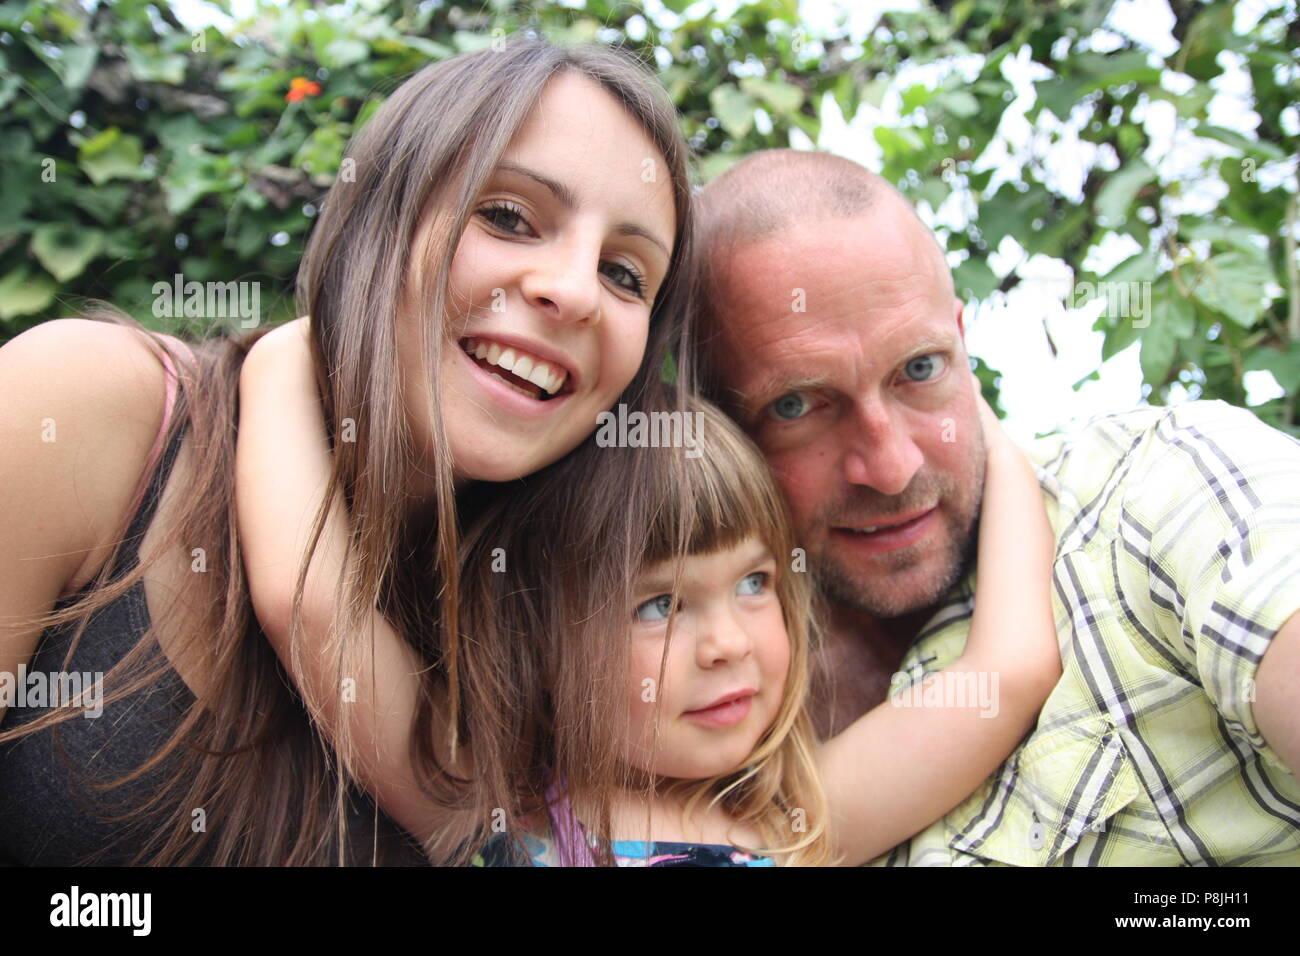 Hermosa familia feliz caricias selfie imagen largo cabello oscuro pareja con niño Imagen De Stock